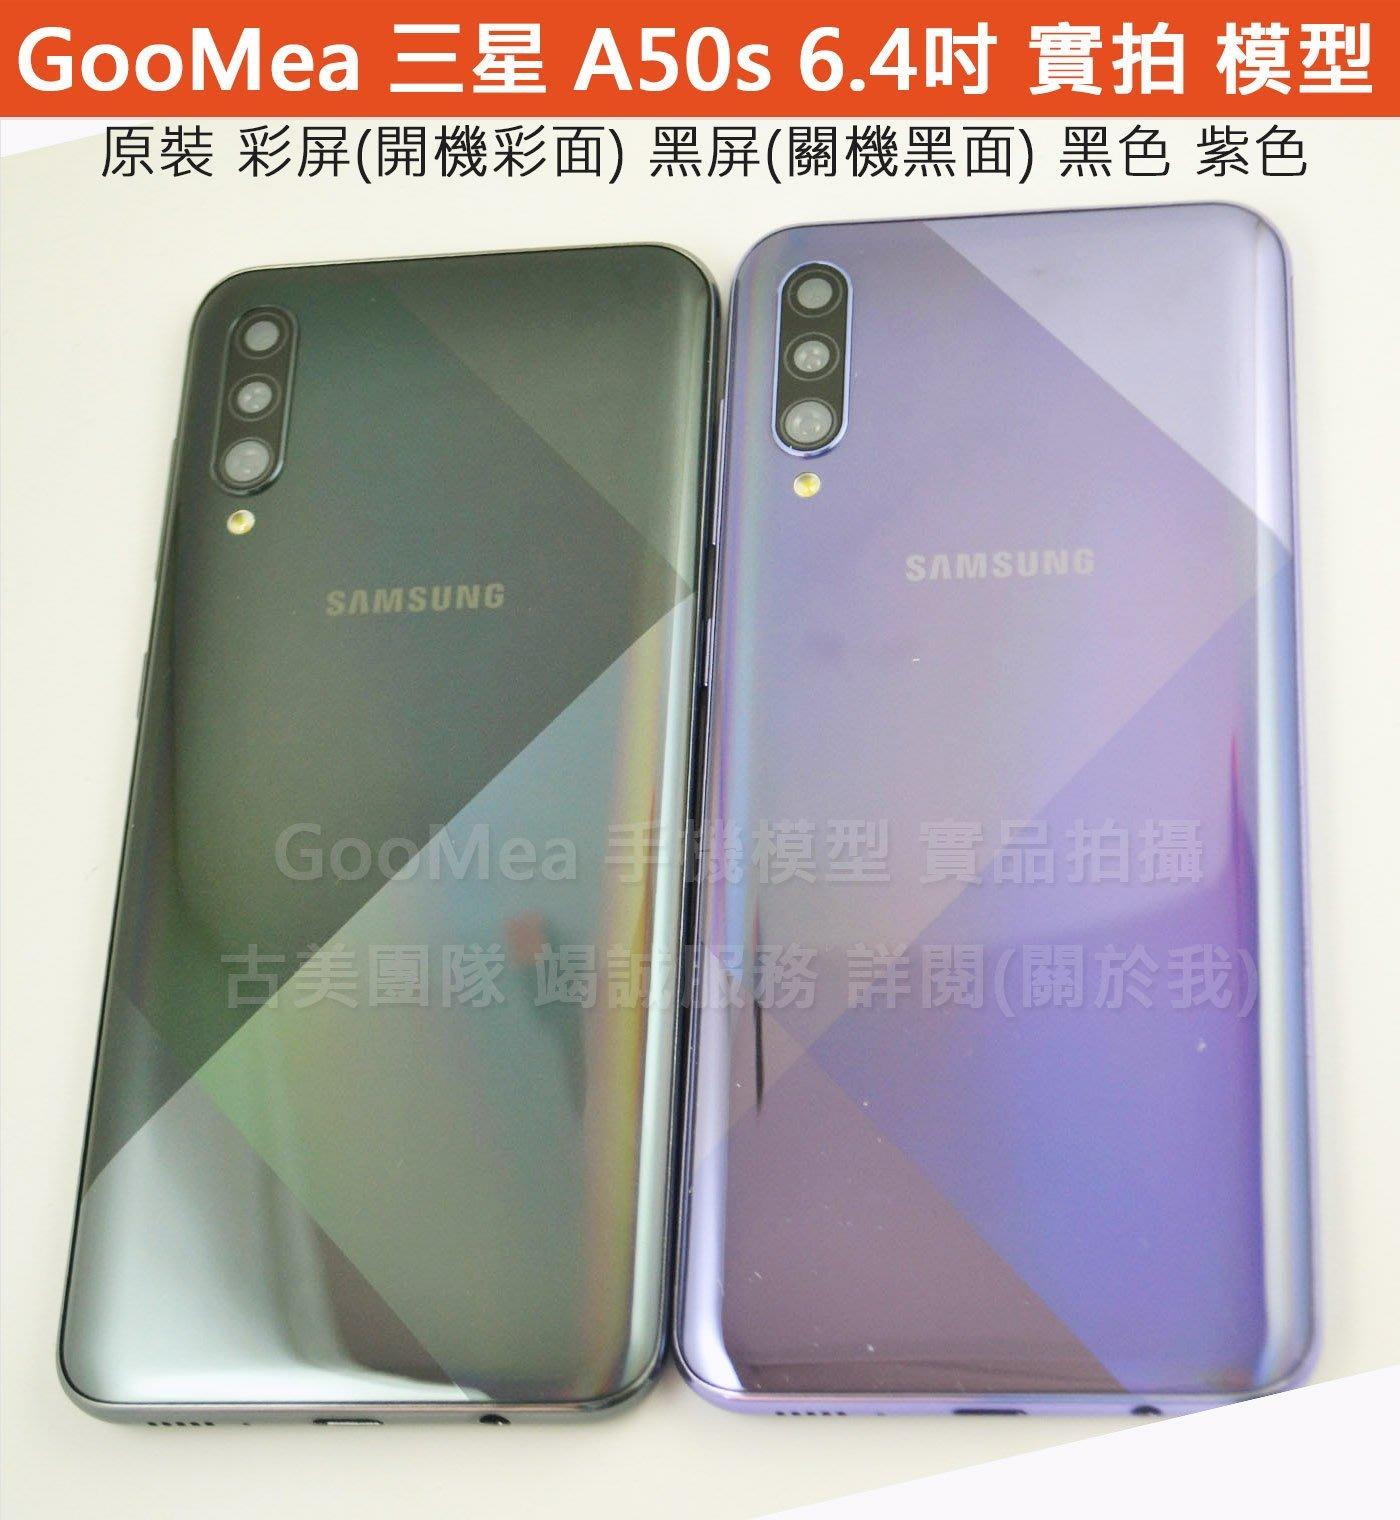 GooMea模型原裝彩屏Samsung三星A30s 6.4吋 A50s 樣品假機包膜dummy拍戲道具仿真仿製上繳摔機